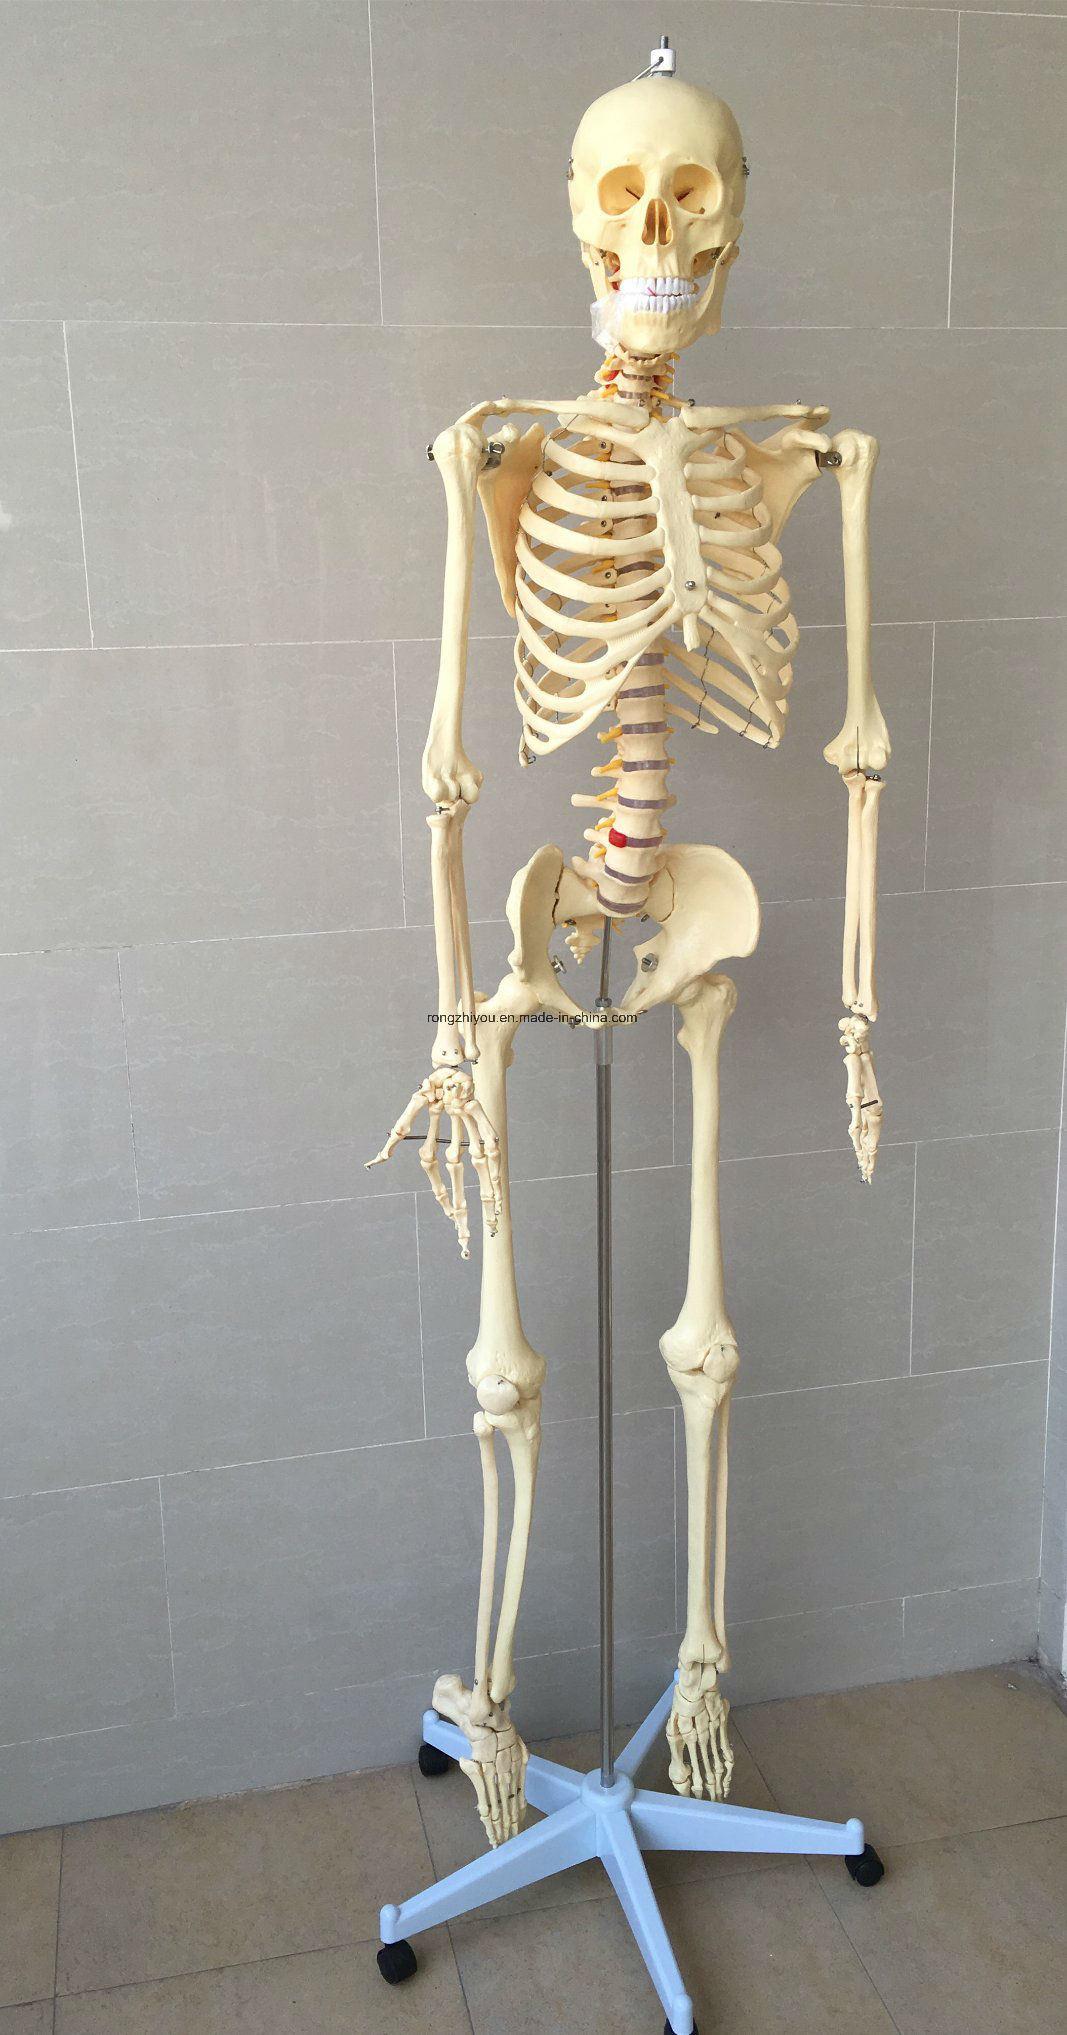 Life Size Human Skeleton Medical Anatomical Skeleton Model